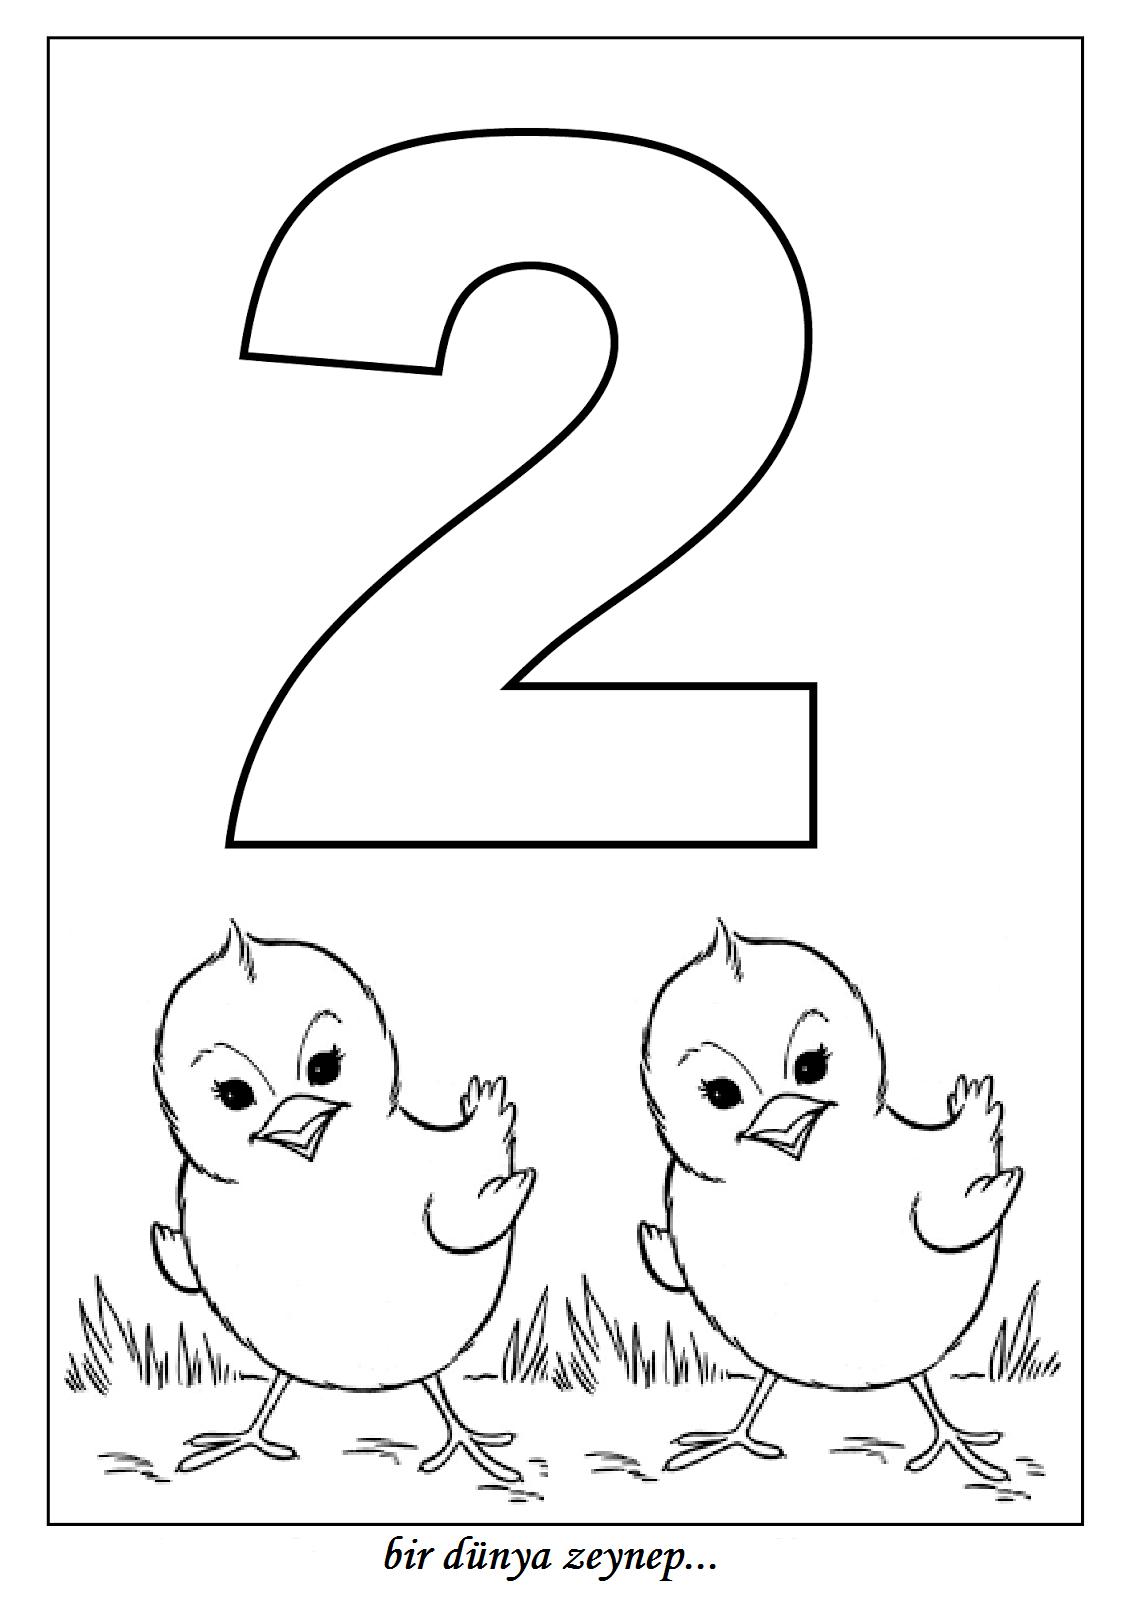 Bir Dunya Zeynep Sayi Boyama Sayfalari 2 Number Coloring